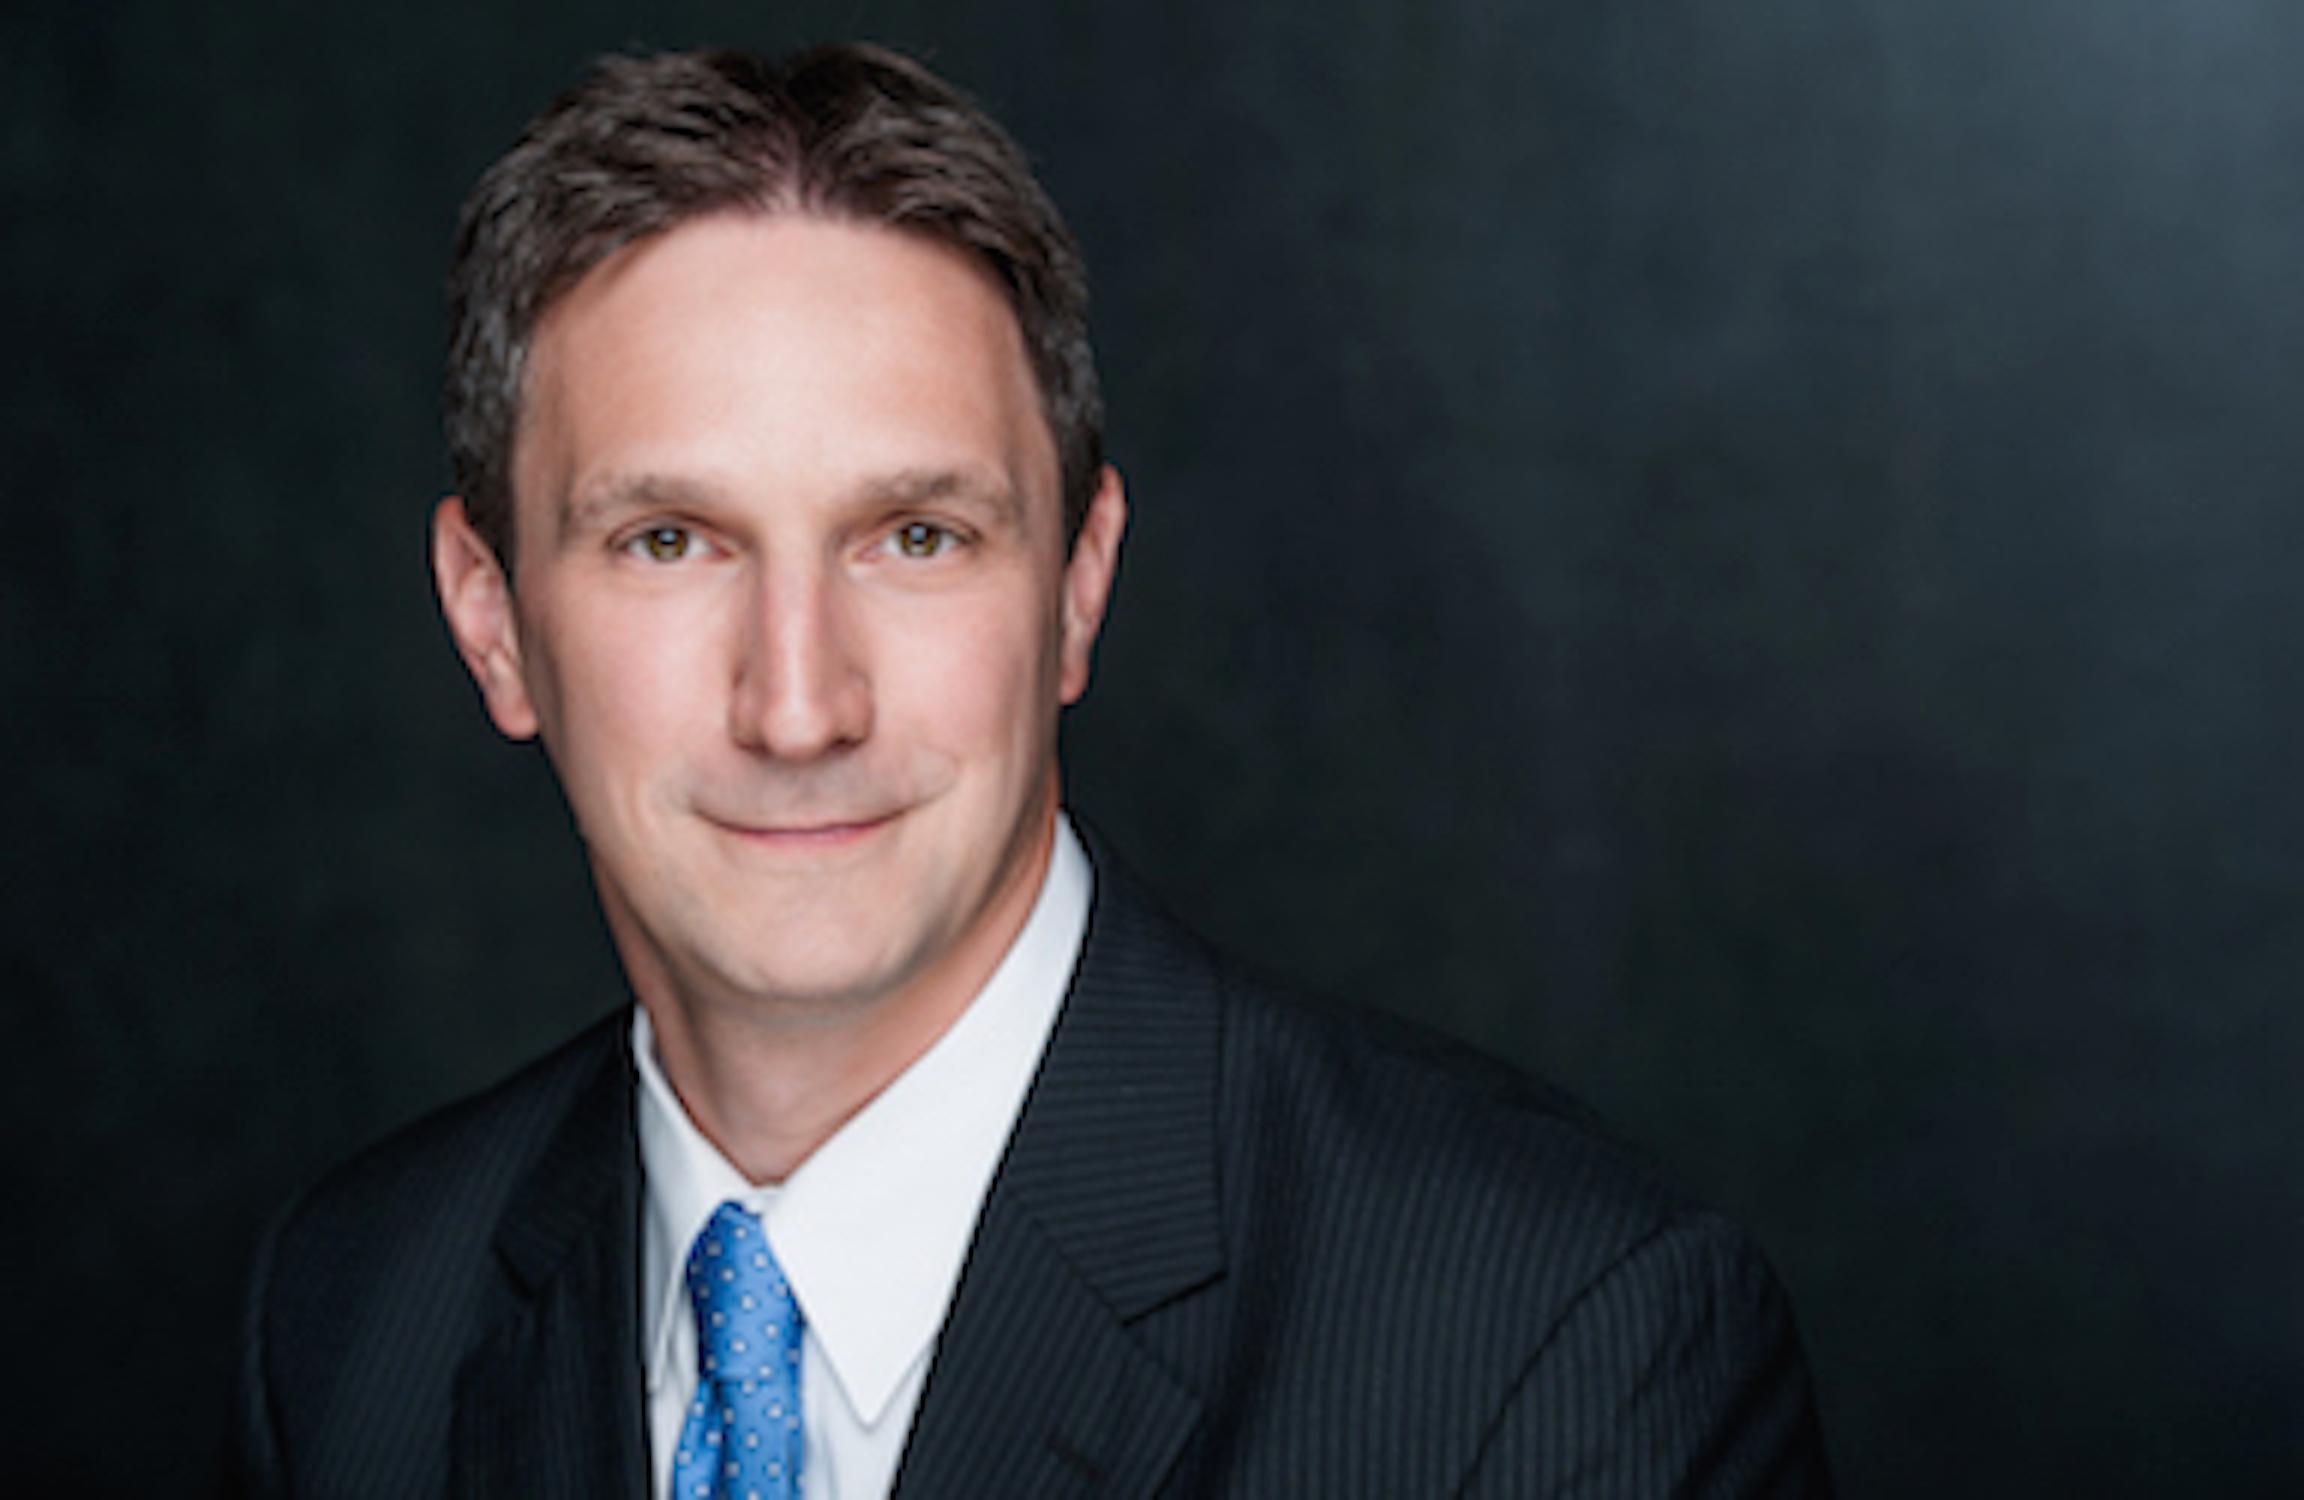 JOHN W. CUCARESE Financial Advisor